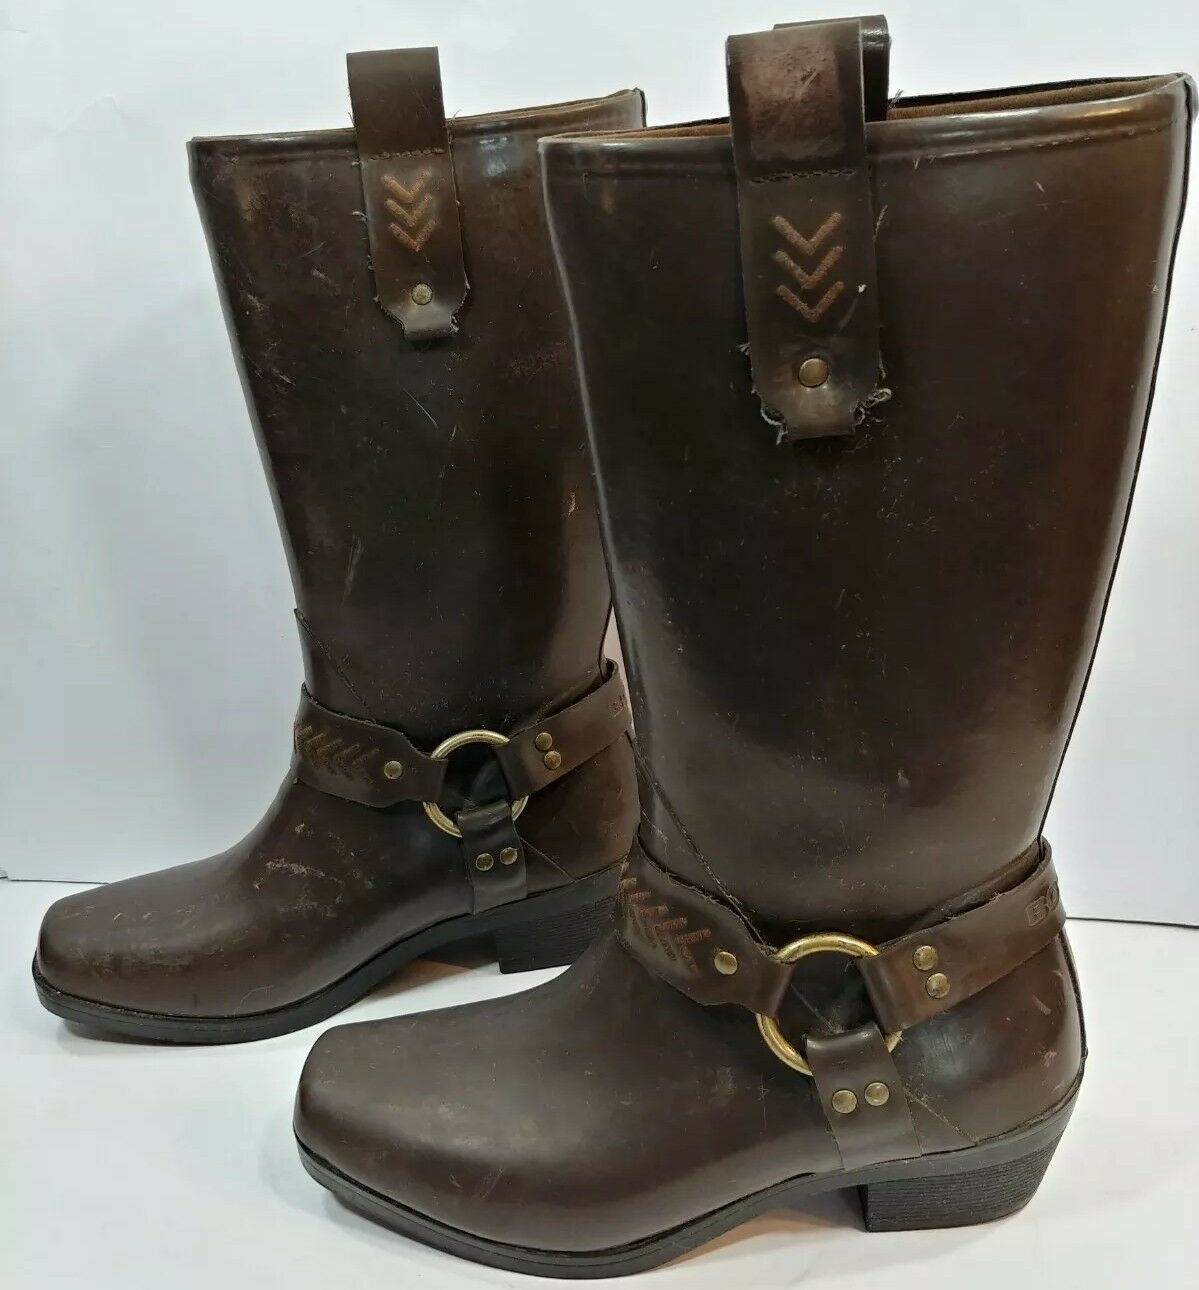 BOGS Dakota Galosh Rain Boots Brown Dingo Moto Waterproof Square Toe Women's 6M